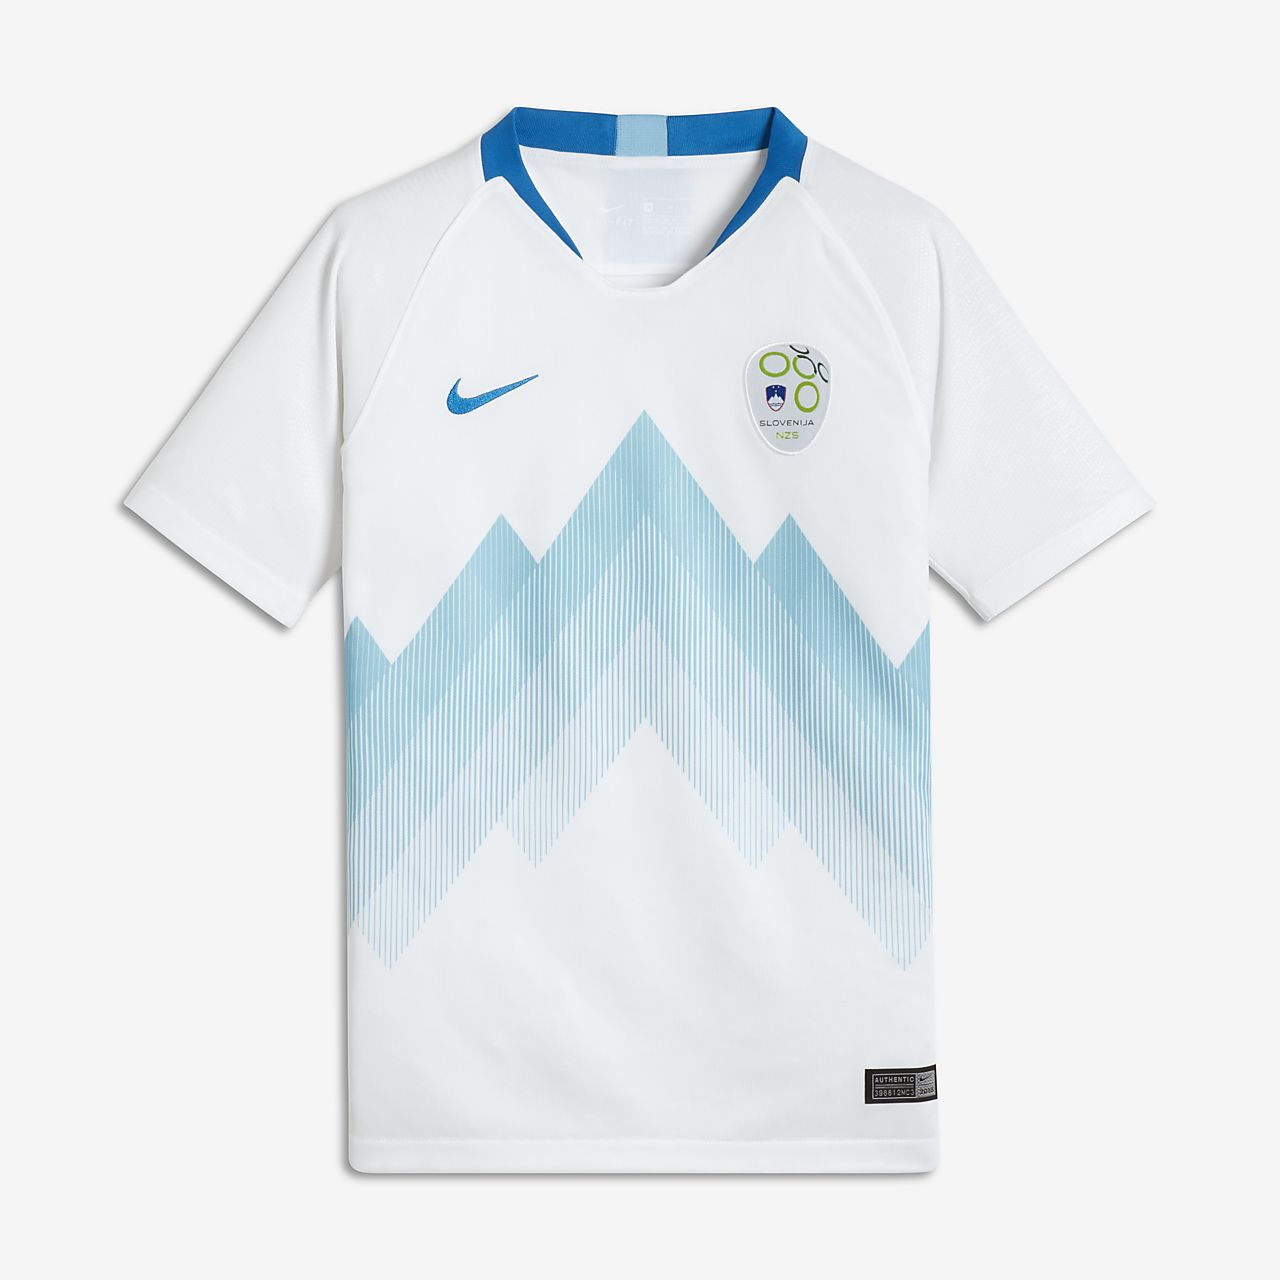 2018 Slovenia Stadium Home Voetbalshirt voor kids